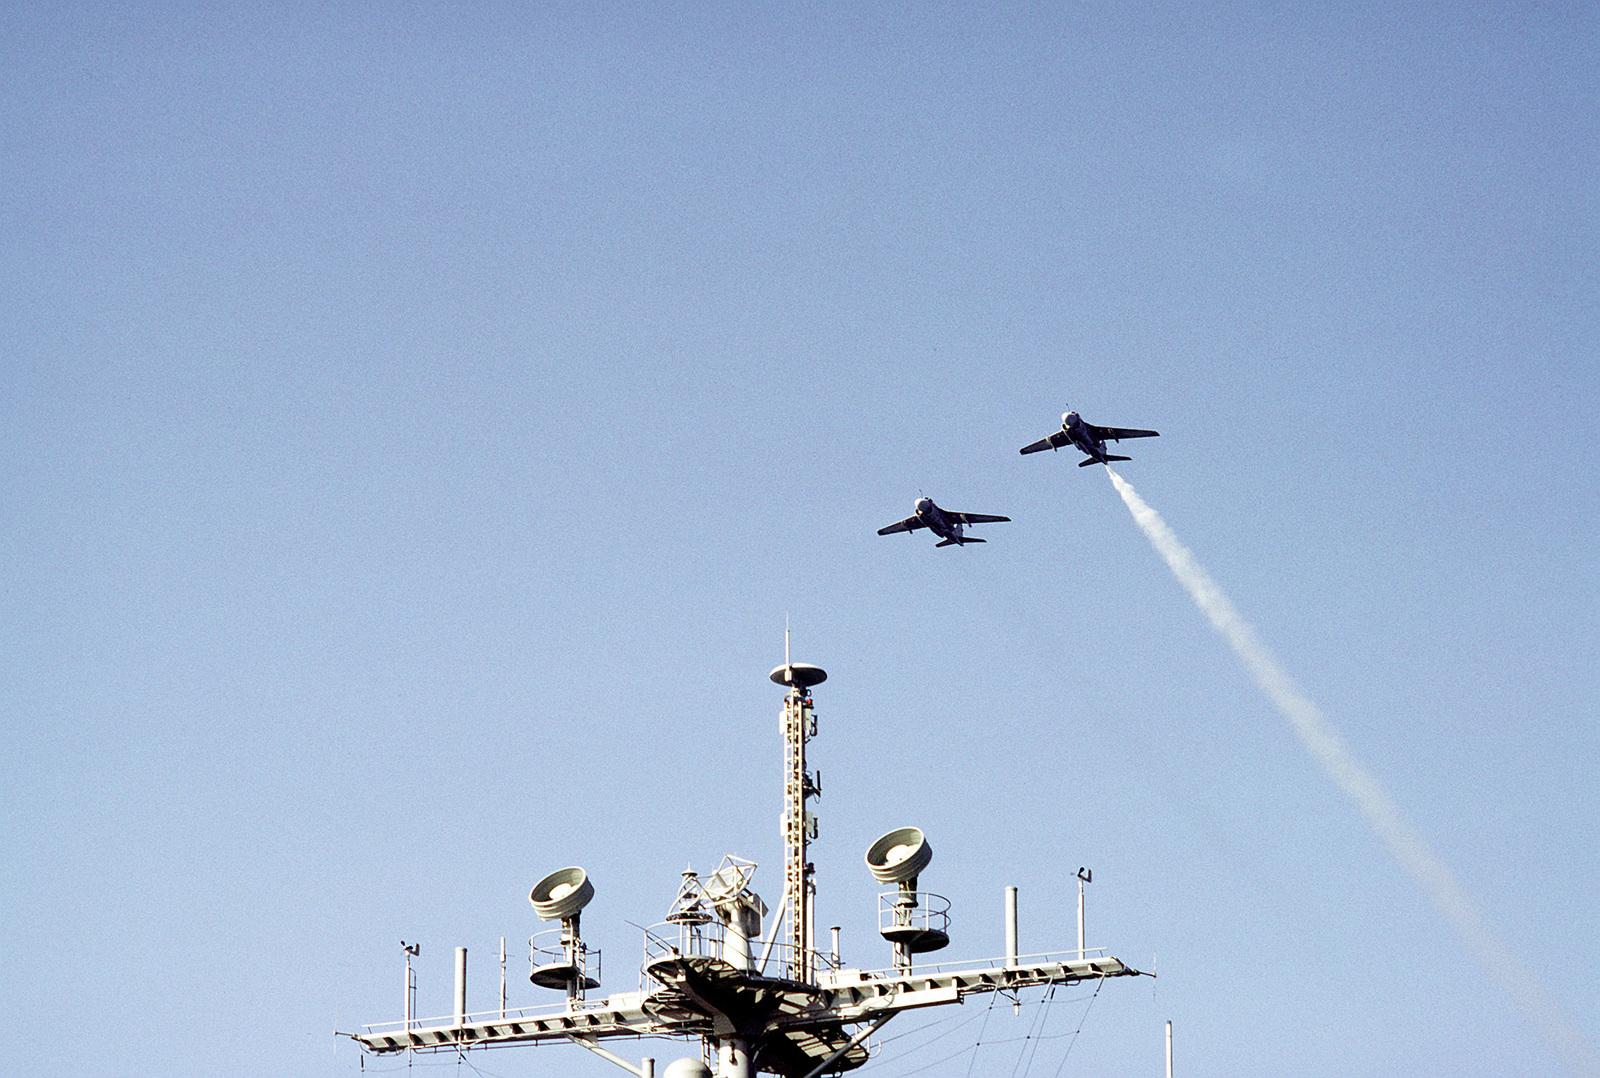 A-6E Intruder aircraft fly over the mast of the nuclear-powered aircraft carrier USS DWIGHT D. EISENHOWER (CVN-69)